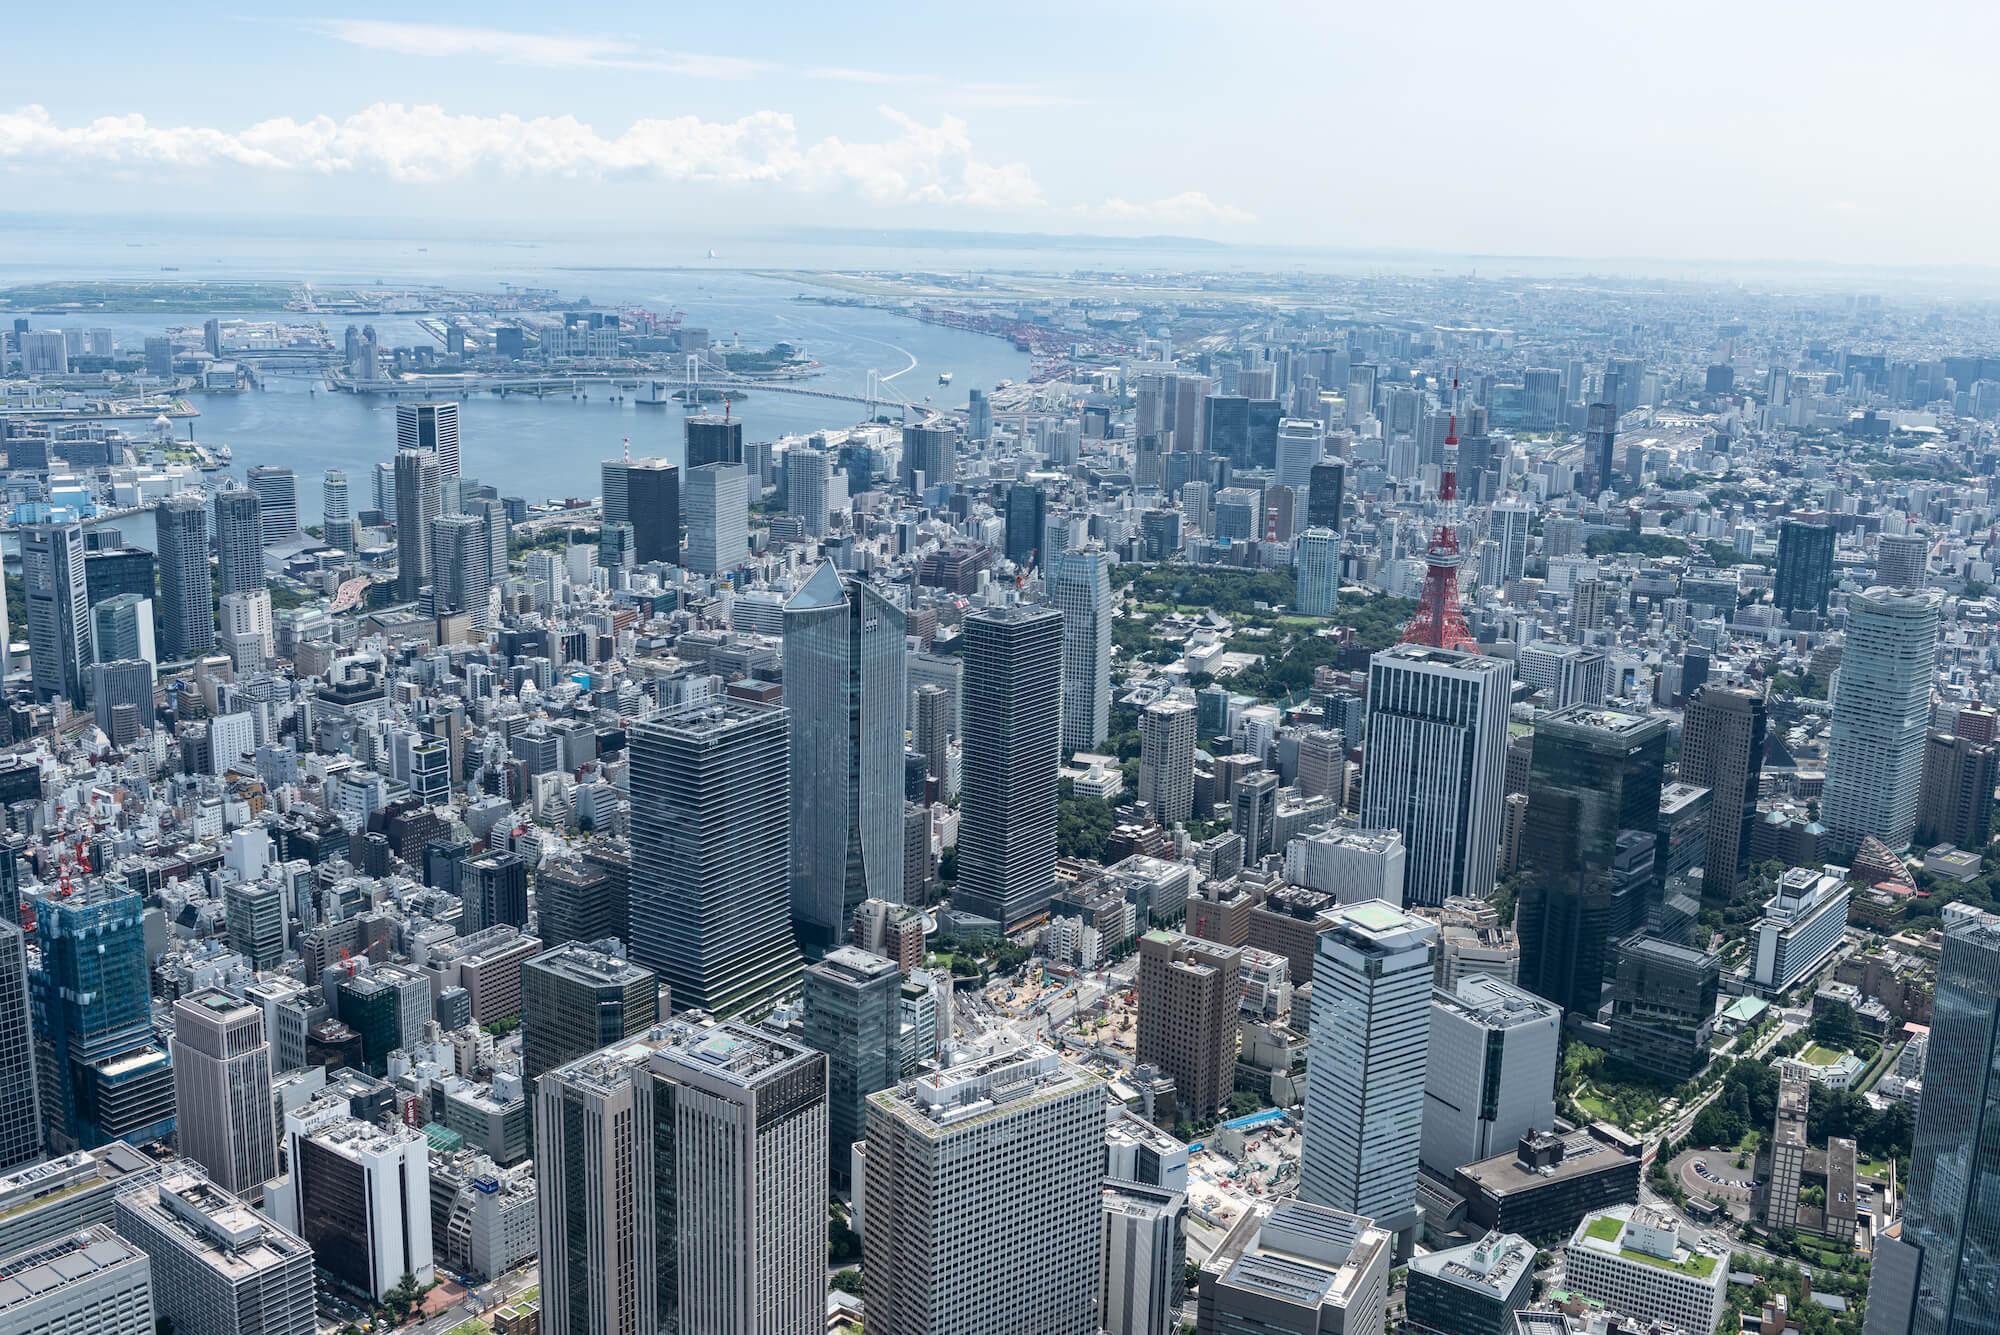 ingenhoven architects, Toranomon Project Tokyo, 2020